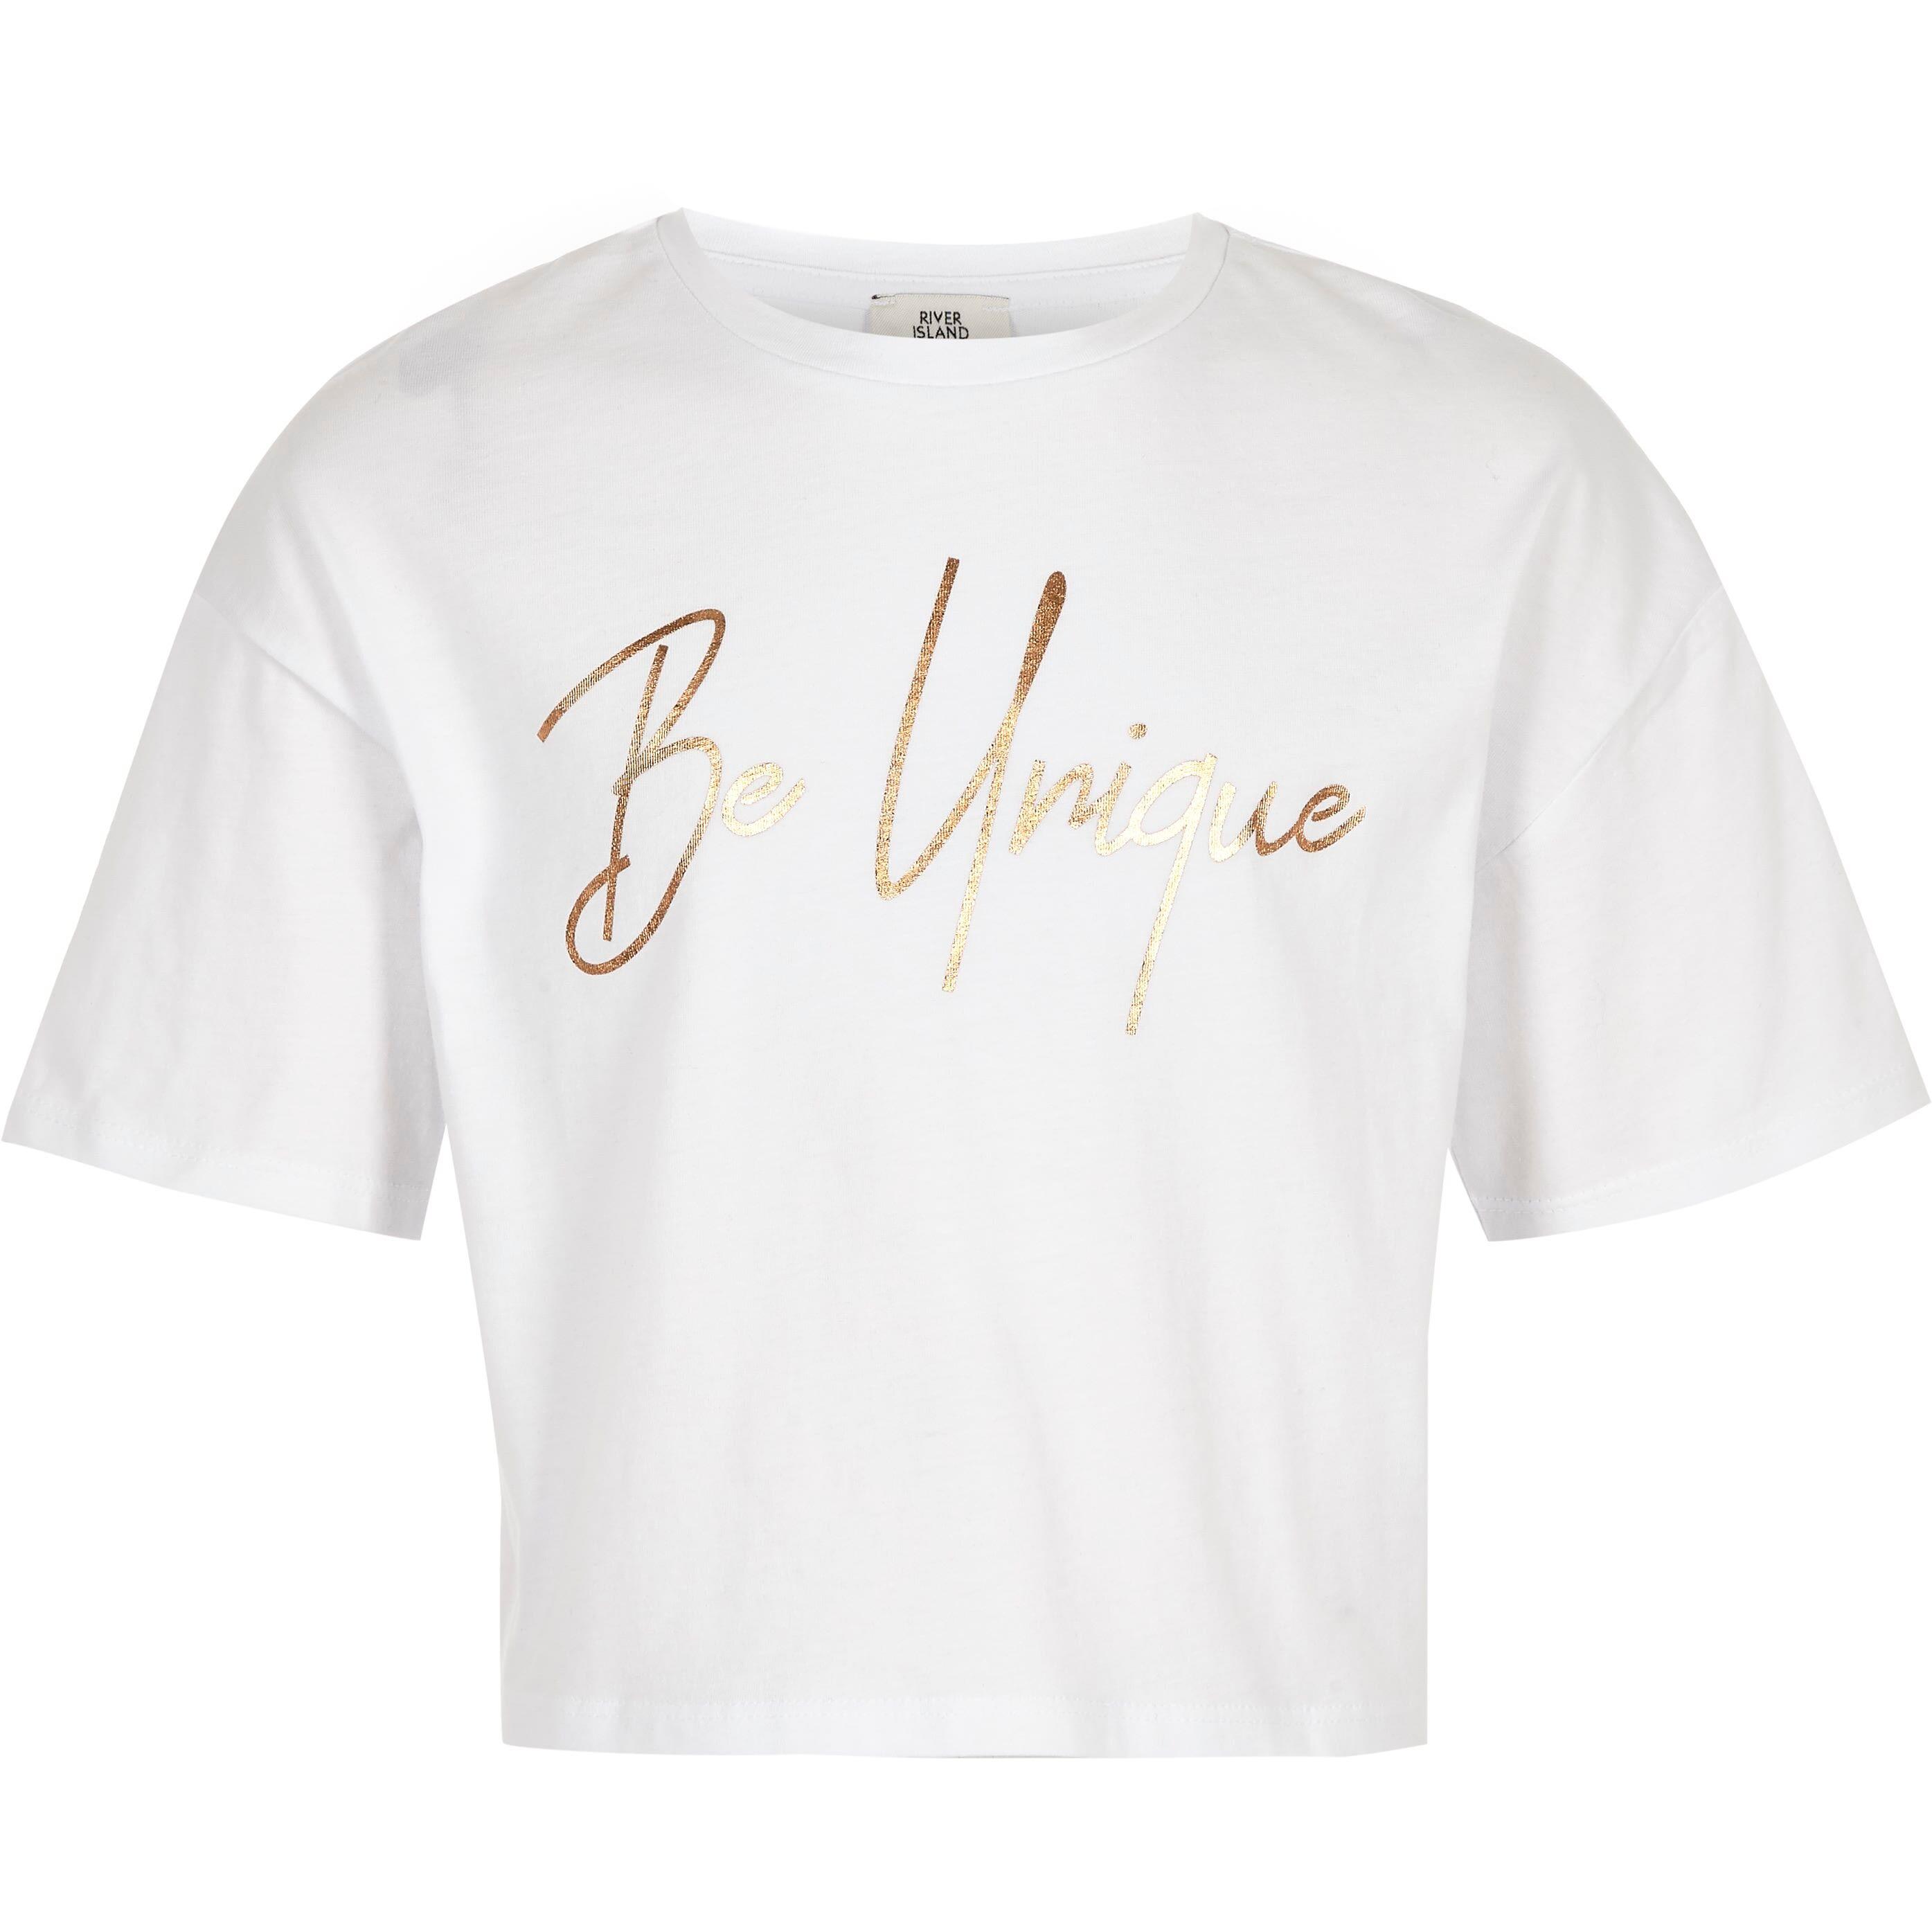 River Island Girls White 'Be unique' crop T-shirt (5-6 Yrs)